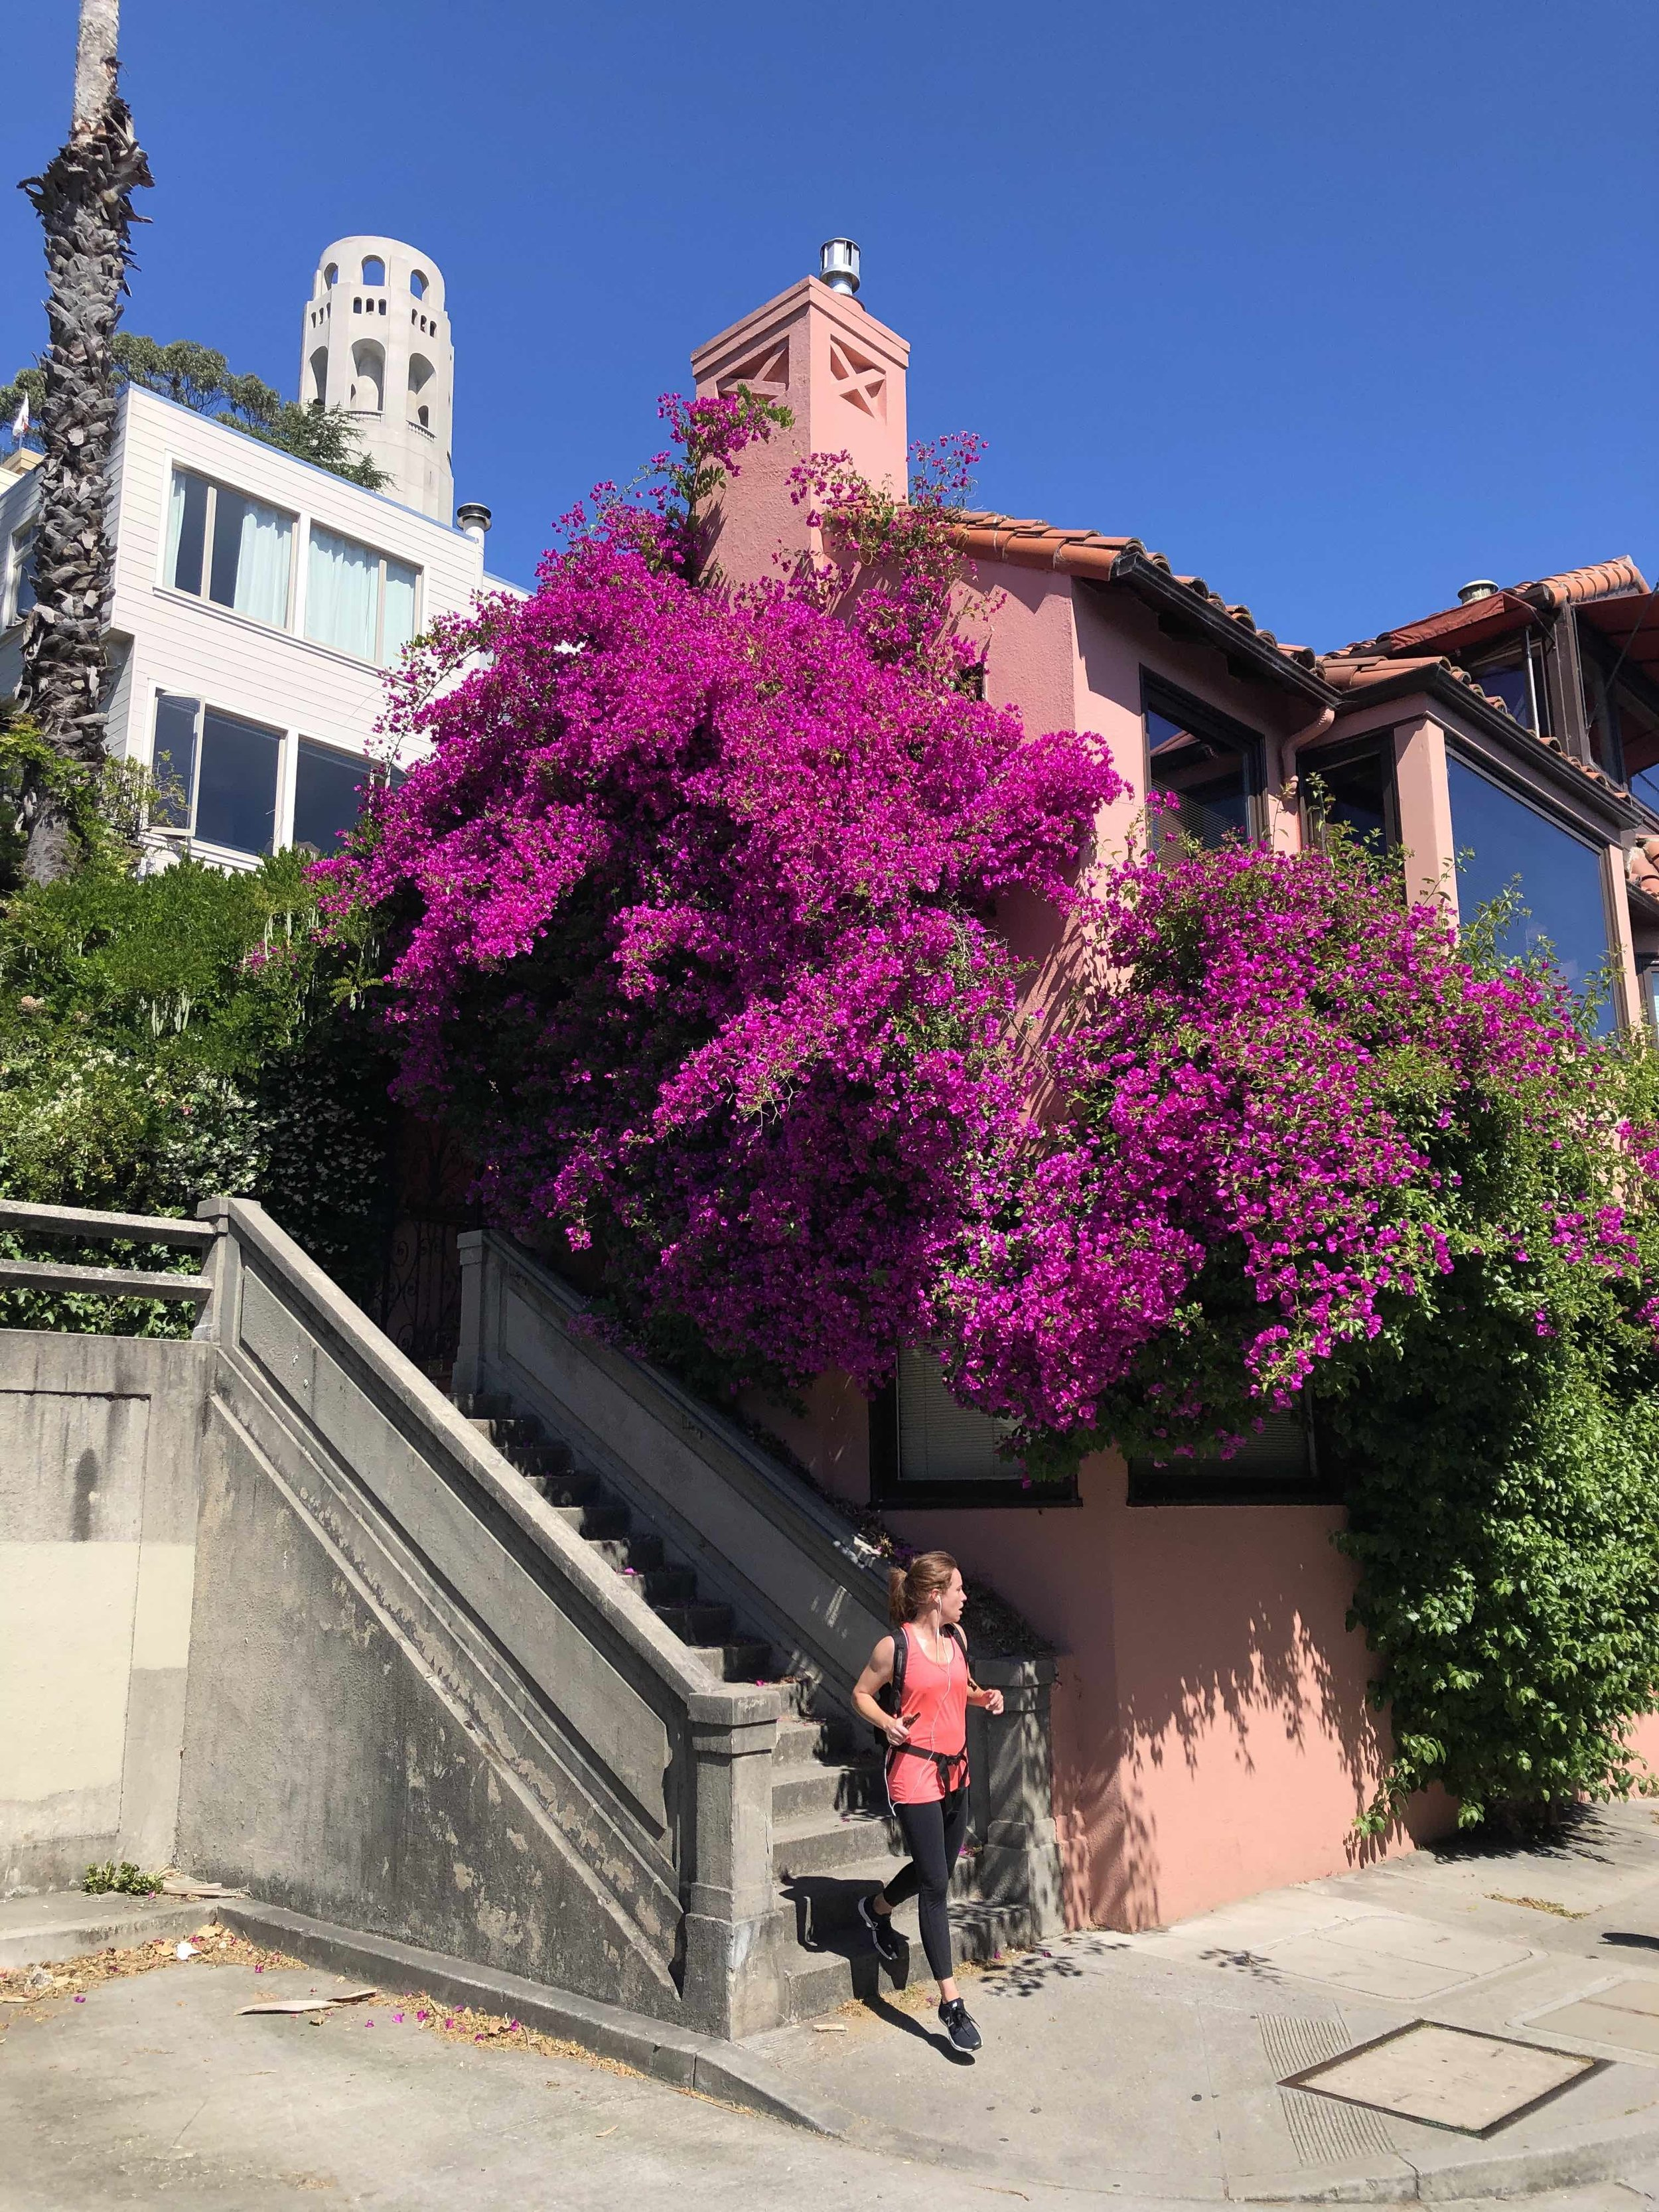 San Francisco's beautiful bougainvillea.